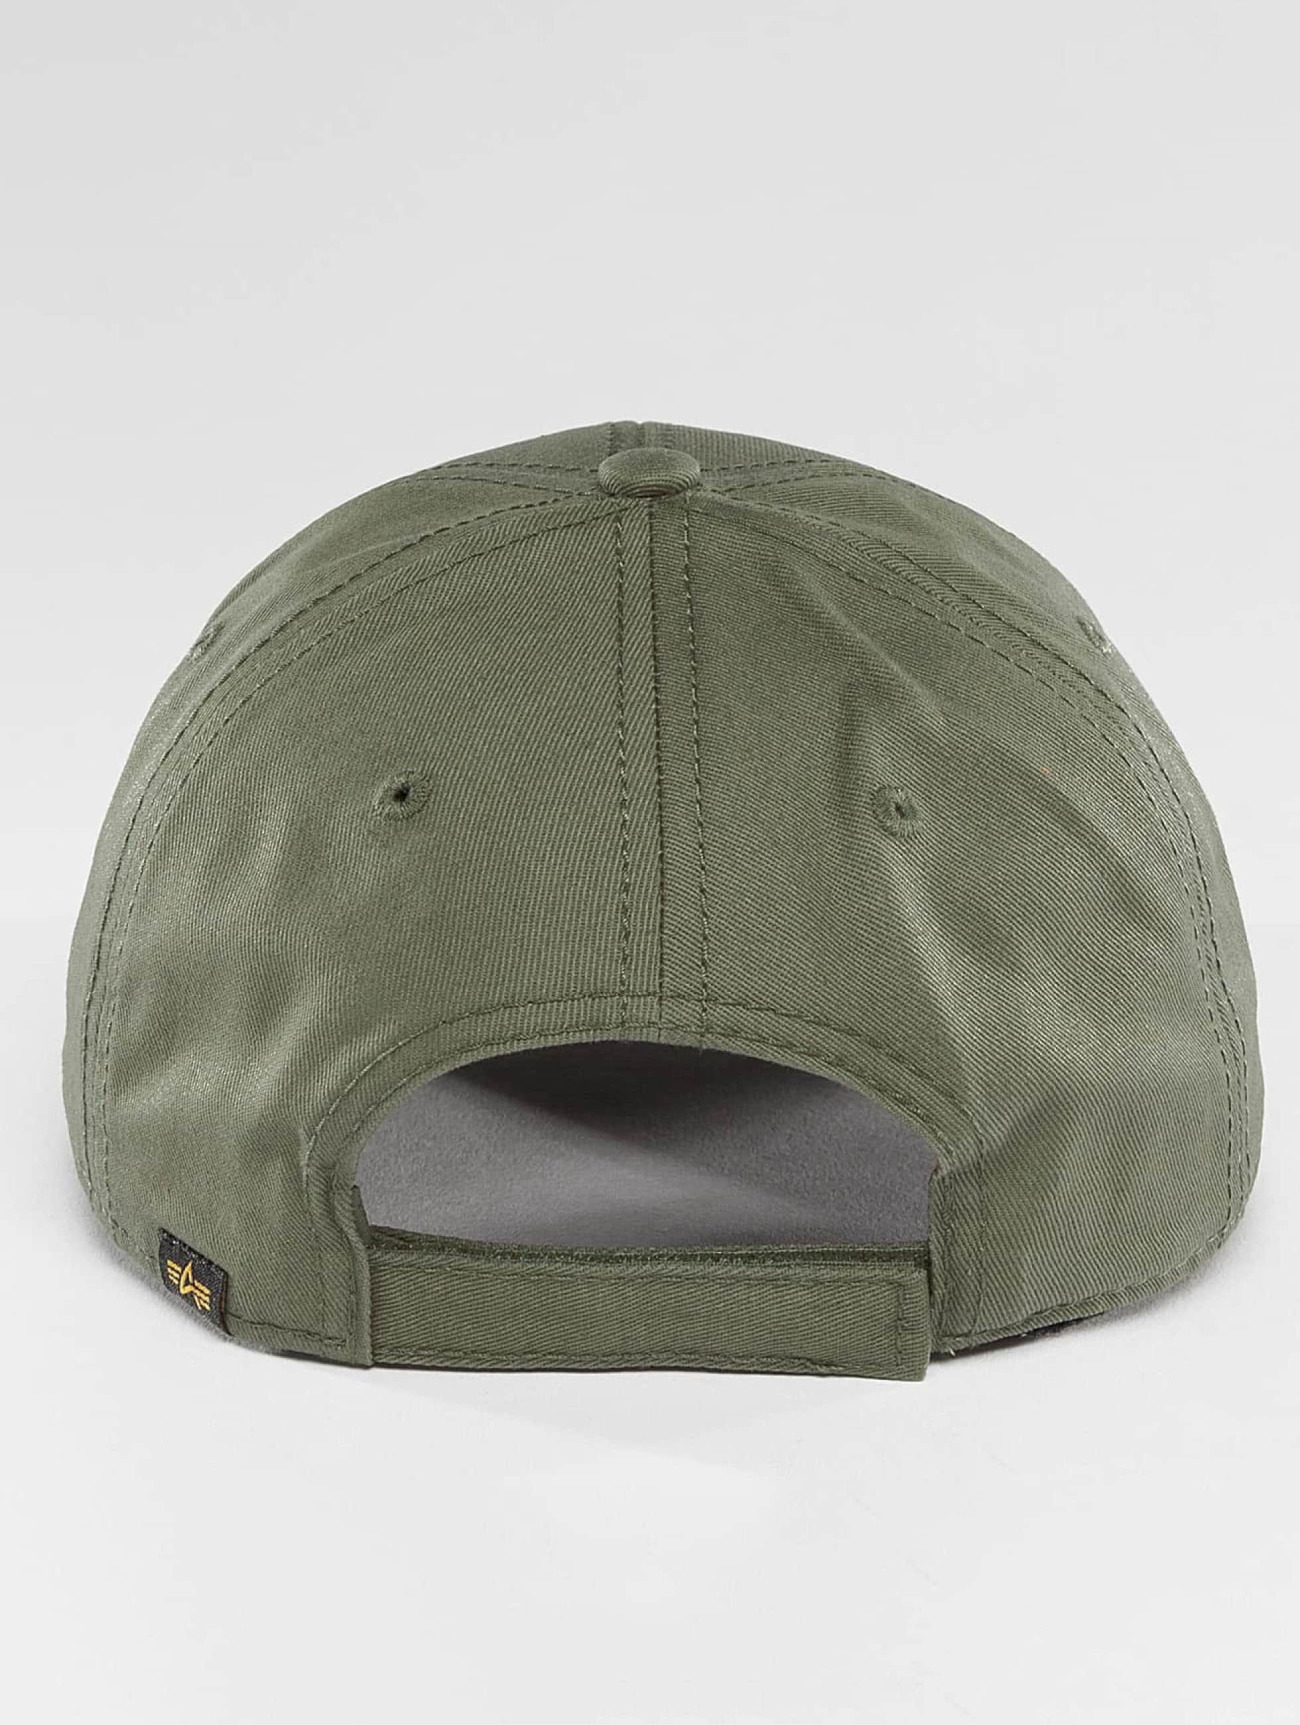 Alpha Industries  Velcro   vert  Casquette Snapback & Strapback  376527 Homme Casquettes